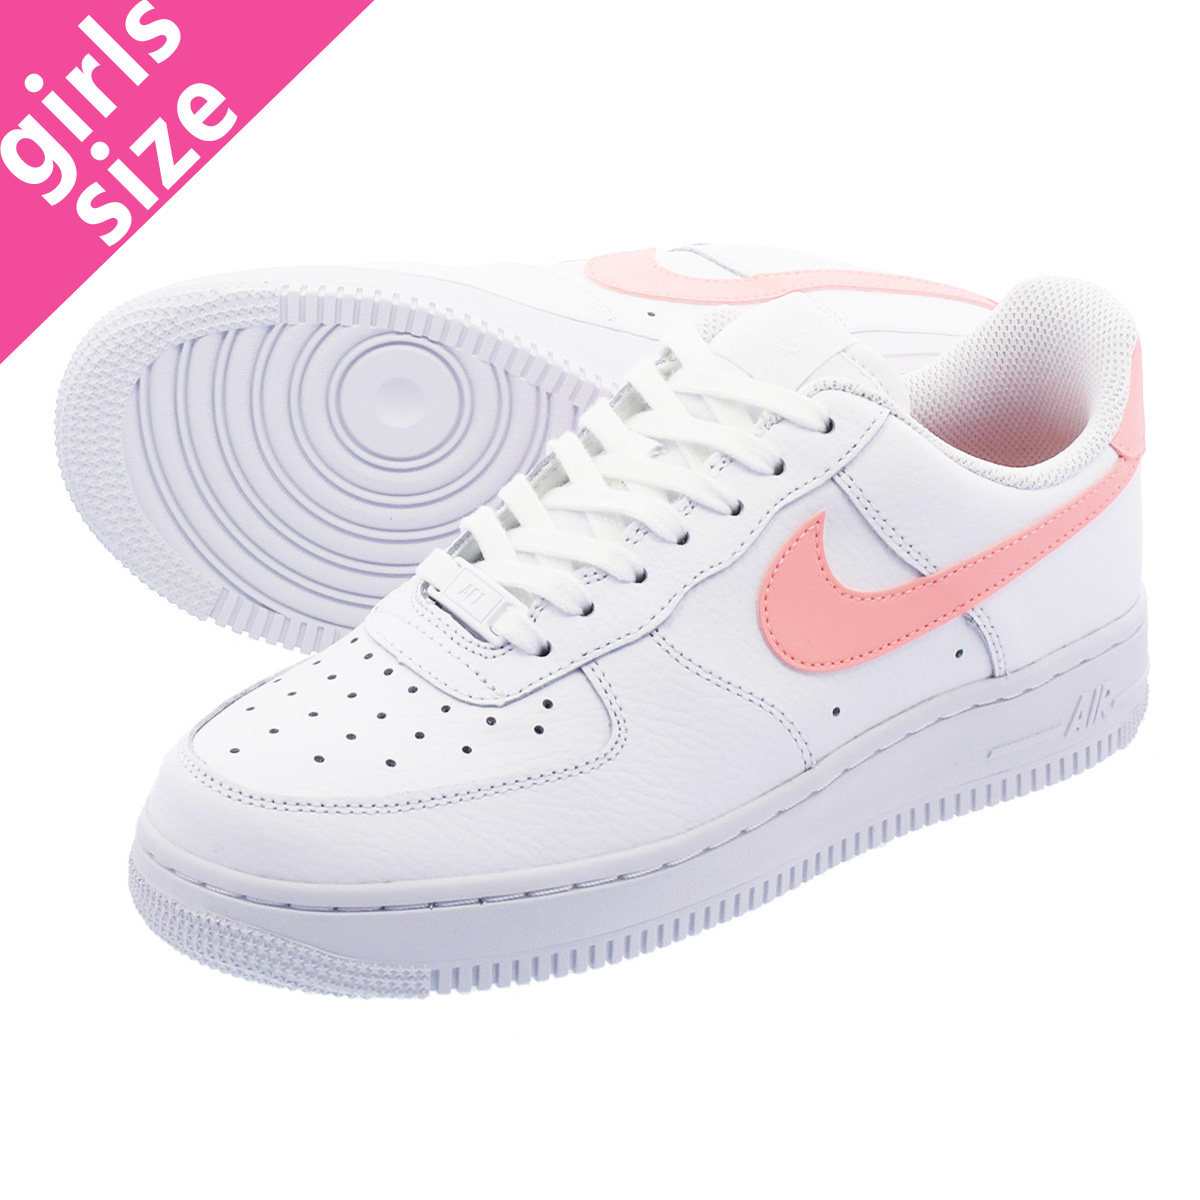 NIKE WMNS AIR FORCE 1 07 Nike women air force 1 07 WHITEORACLE PINKWHITE ah0287 102 l